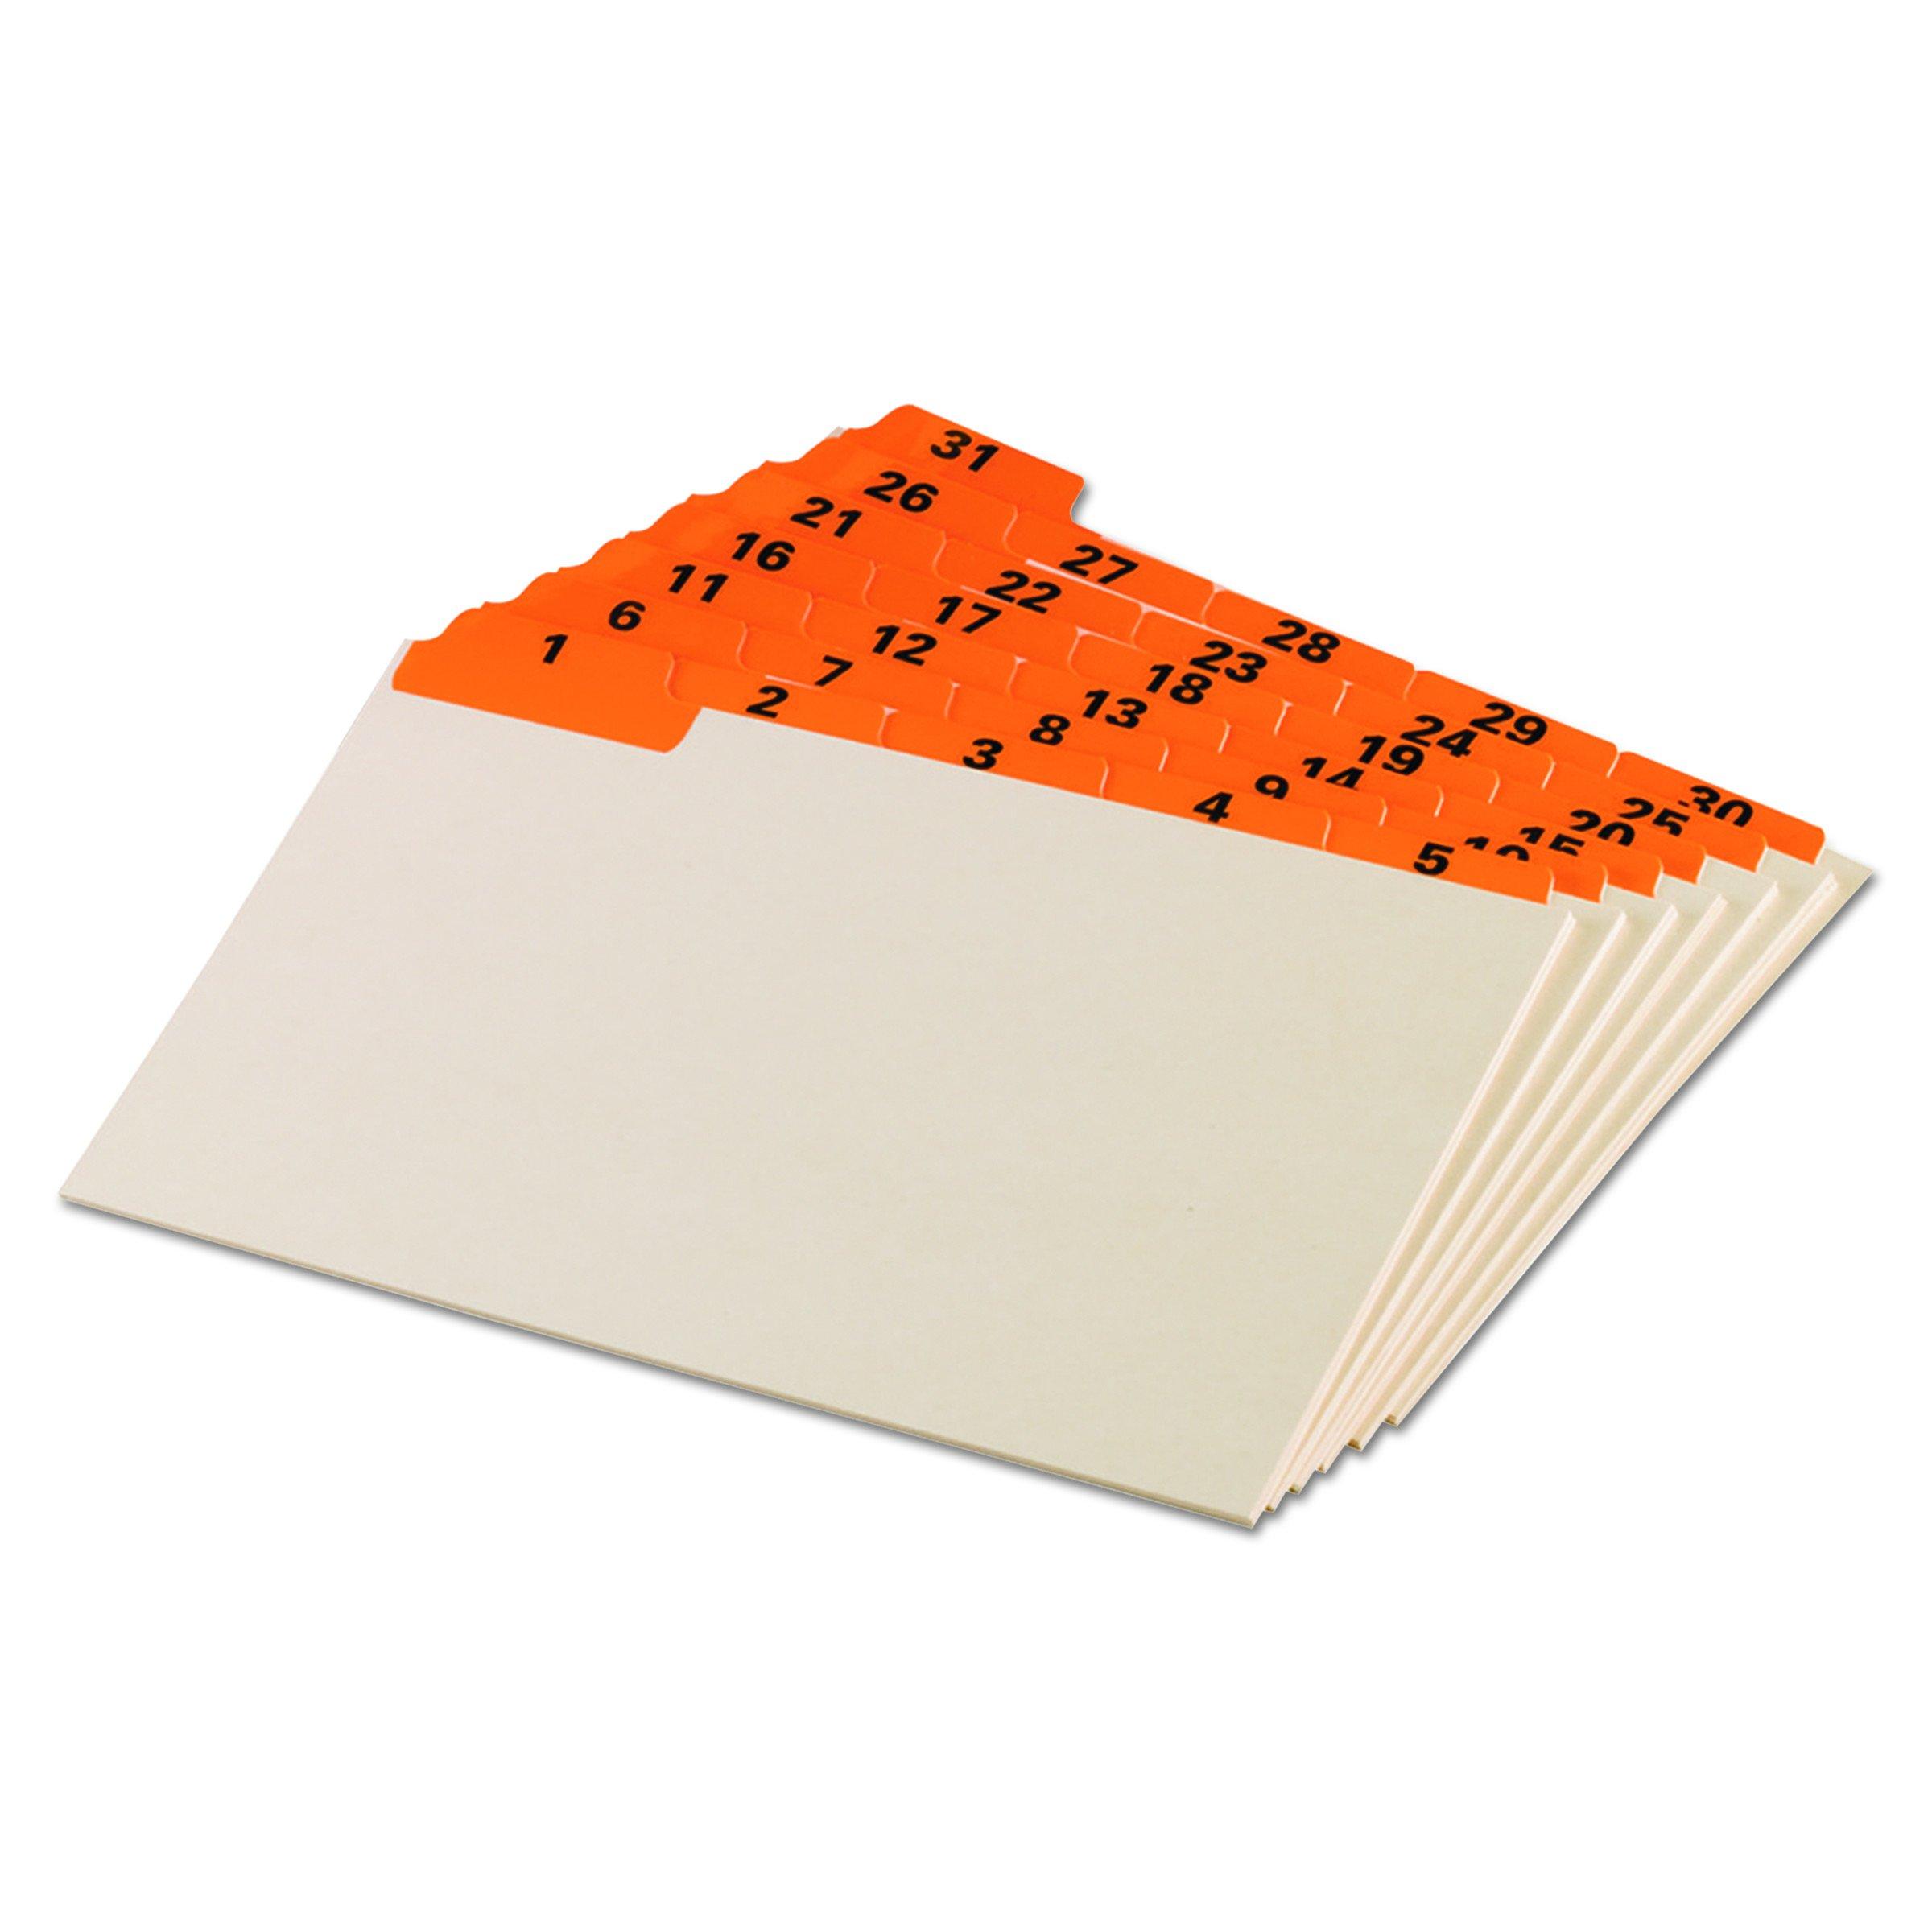 Oxford 05832 Laminated Tab Index Card